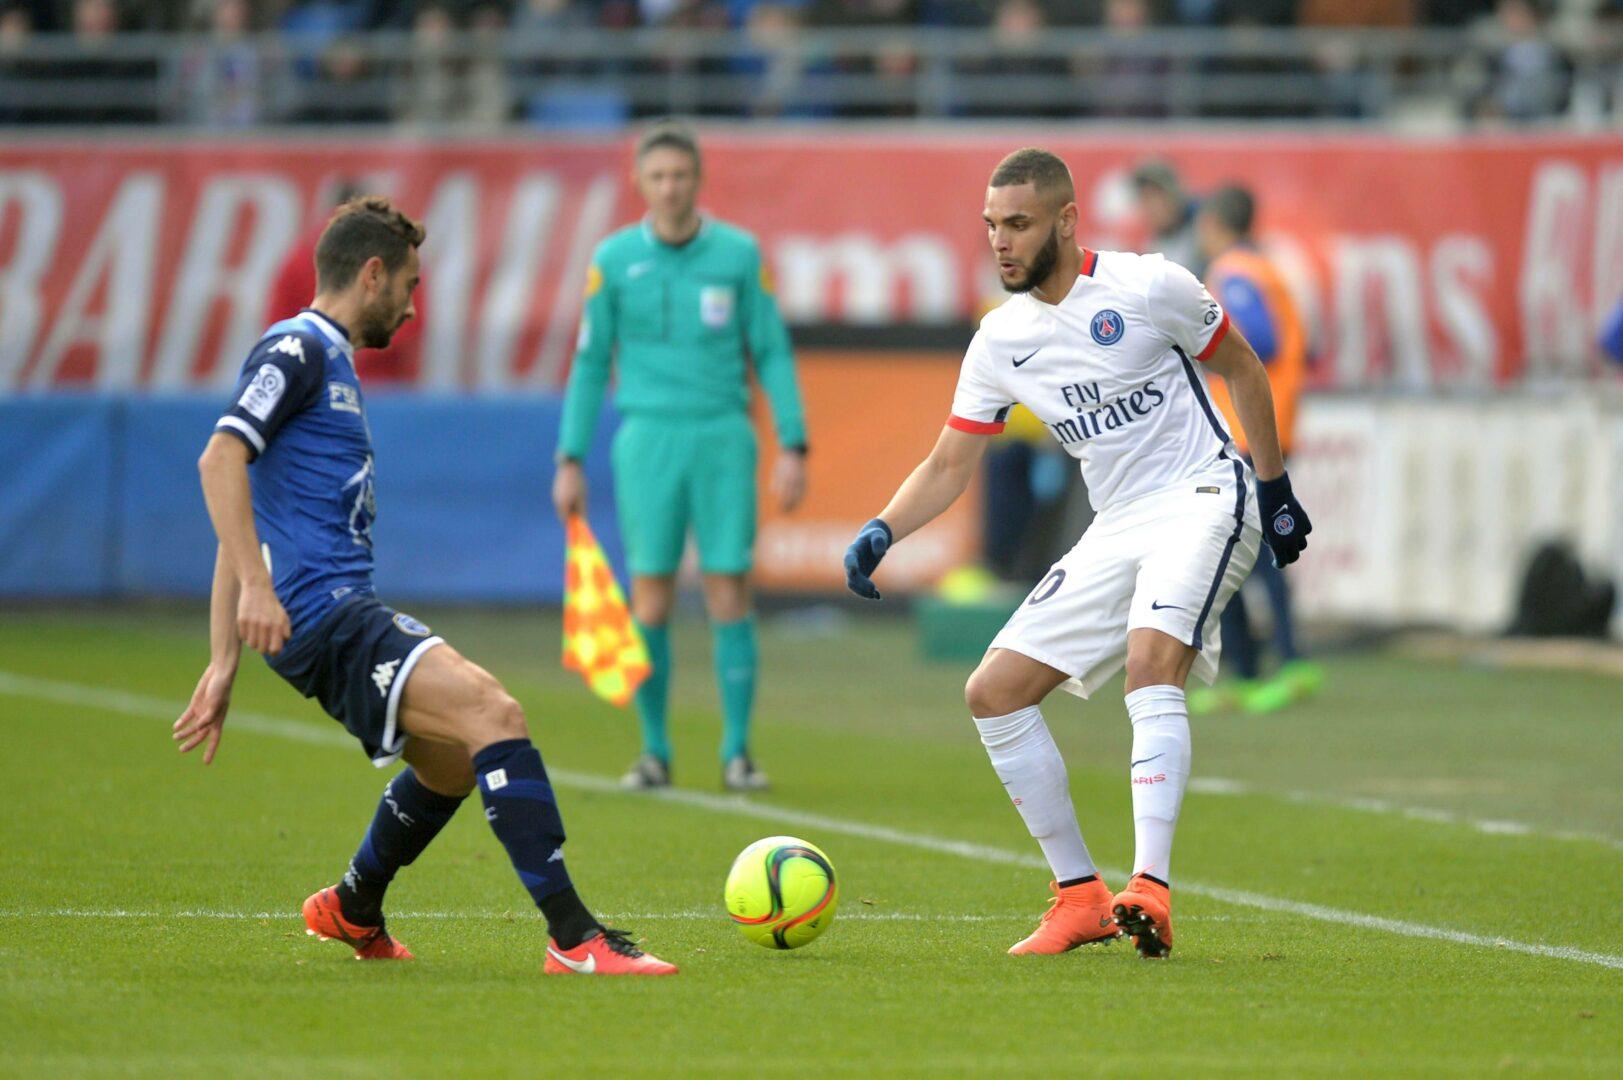 Troyes PSG Ligue 1